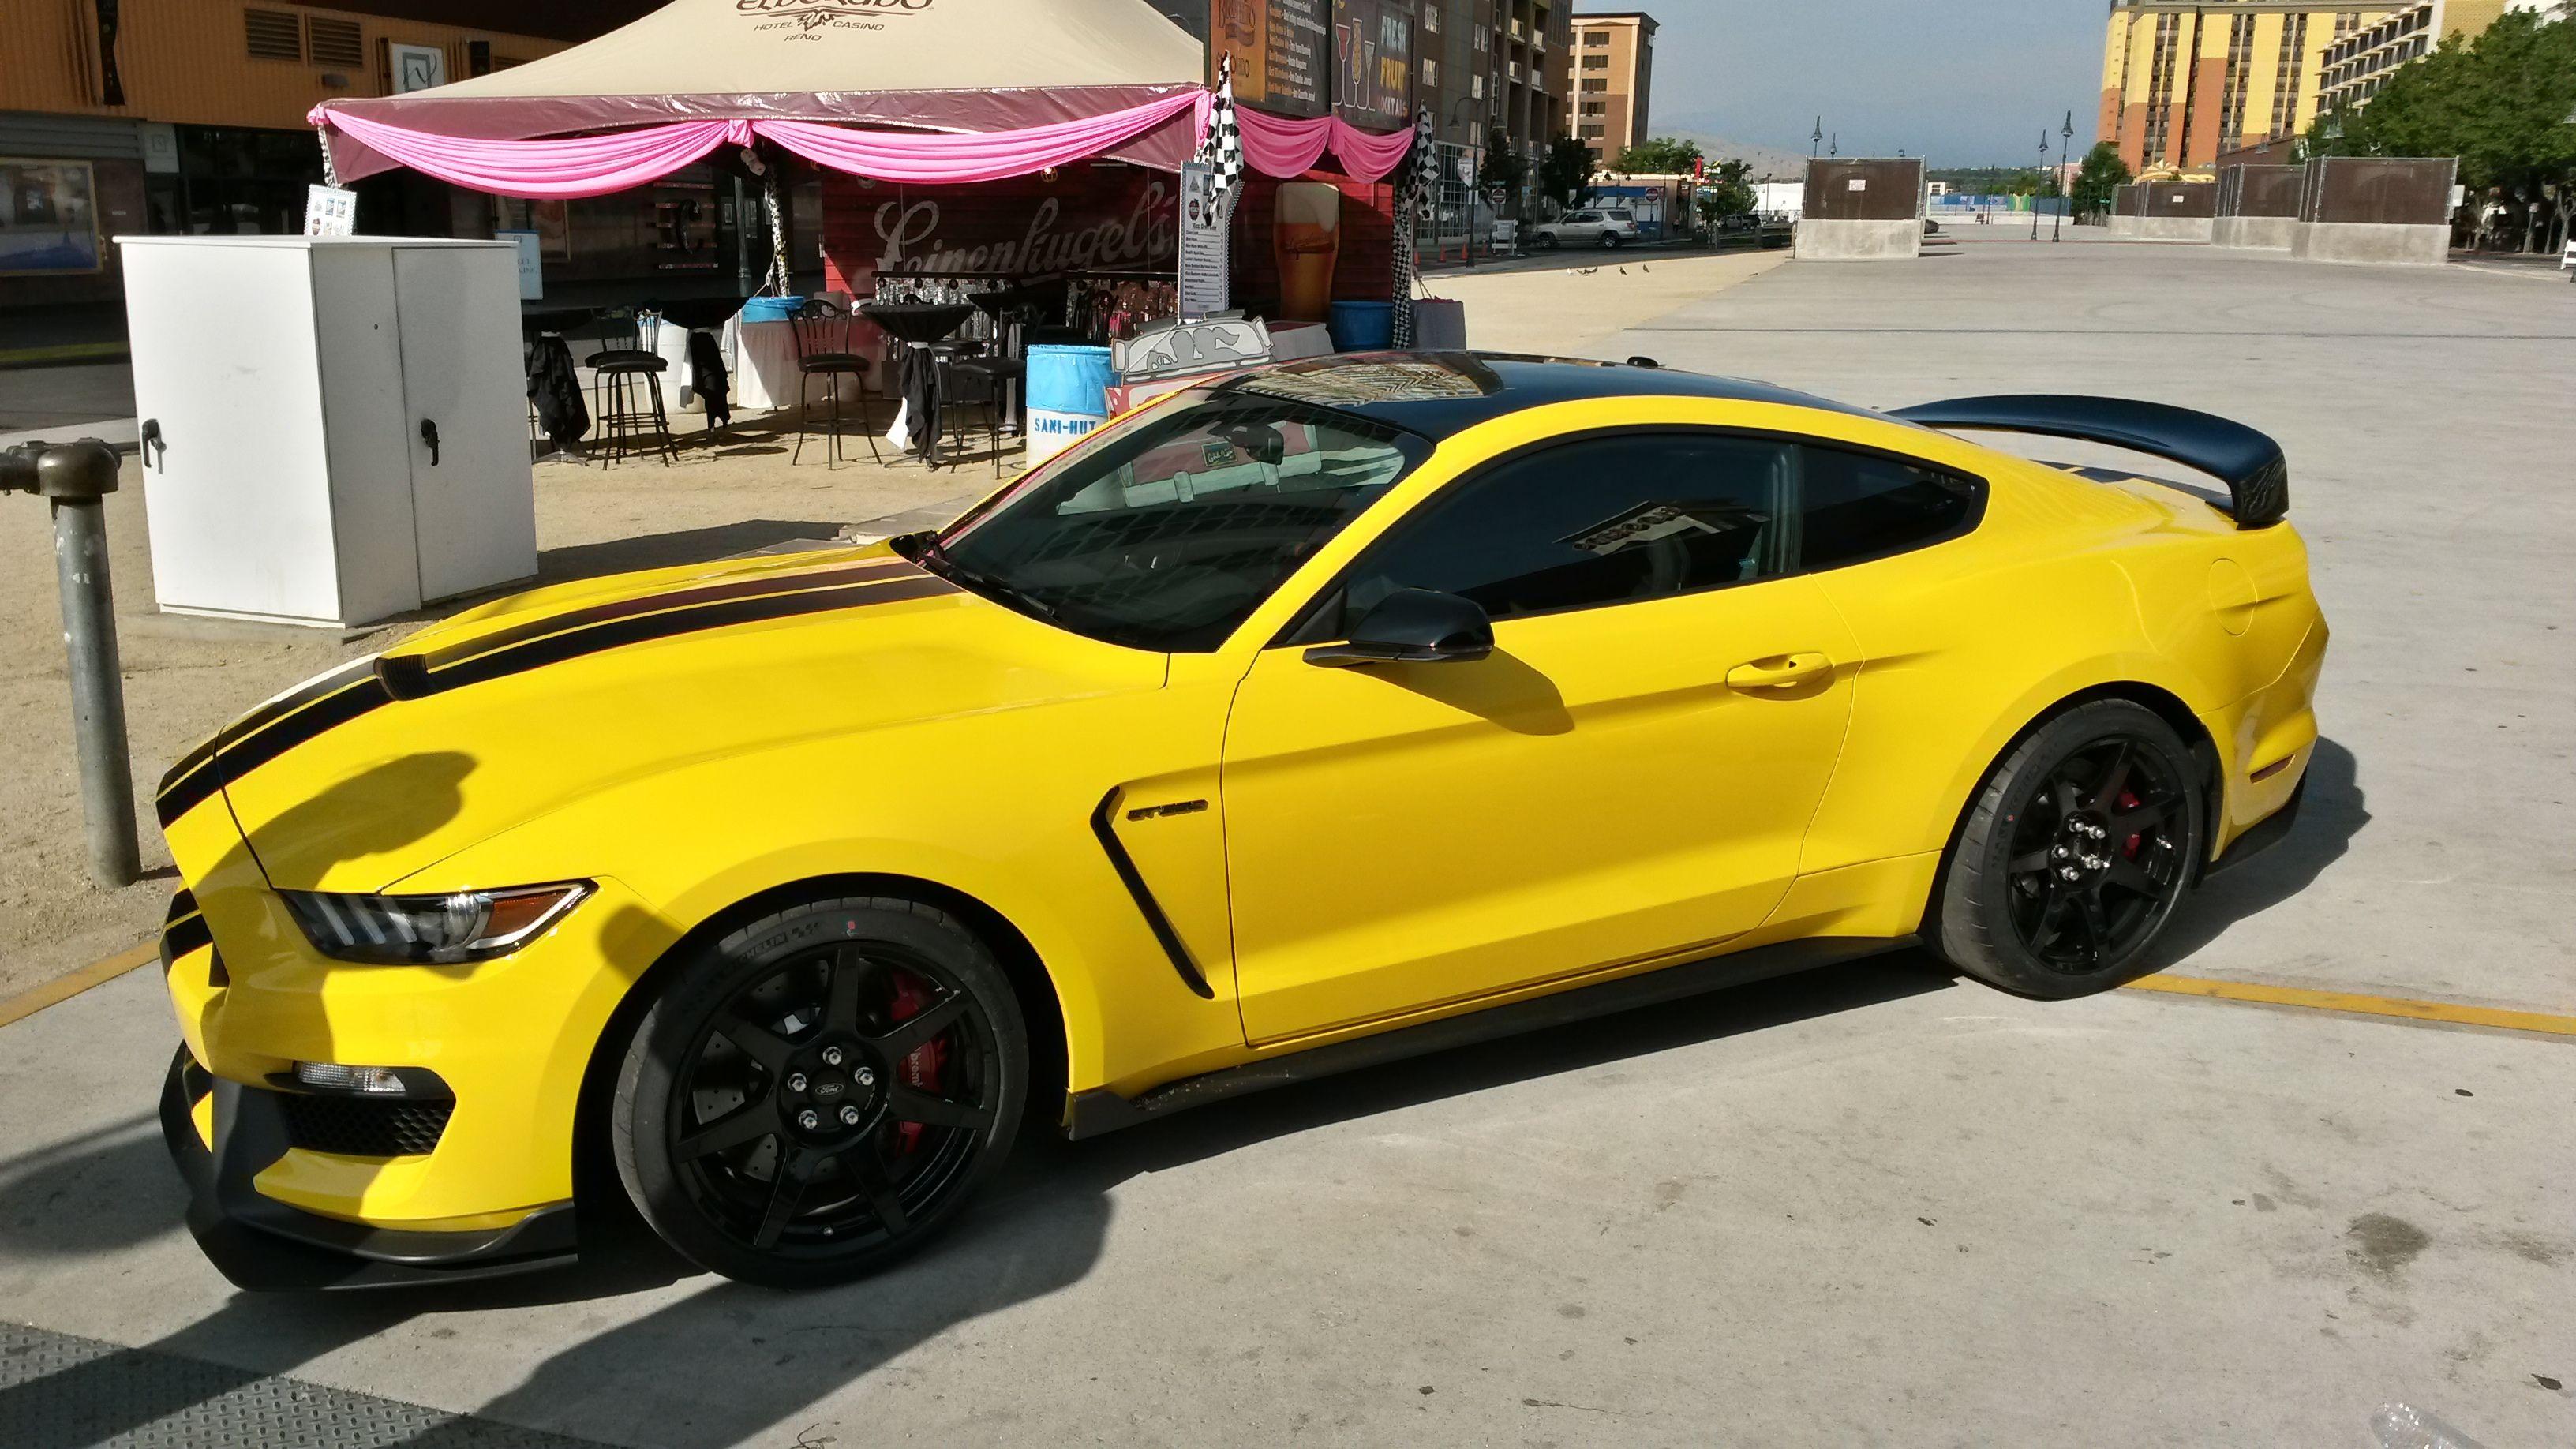 2016 Mustang Gt350r Triple Yellow Black W Red Racing Stripe